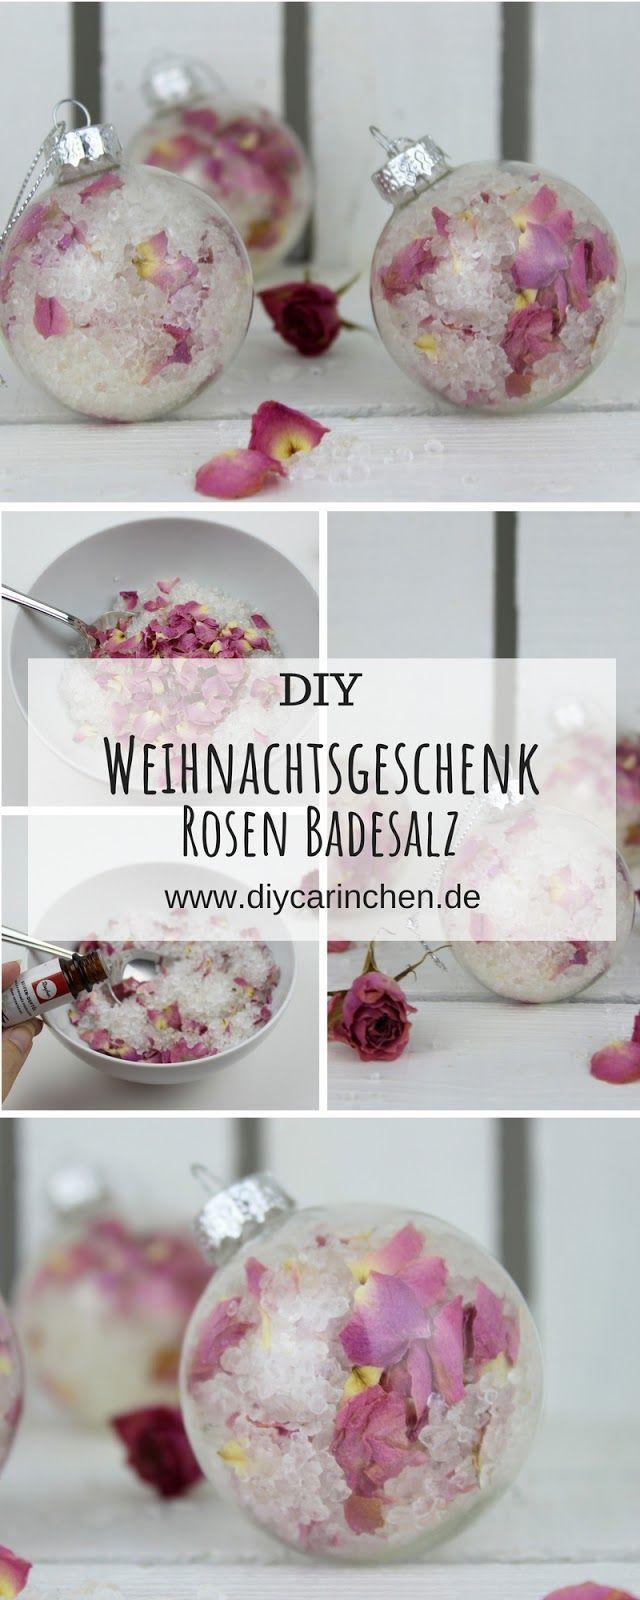 DIY Badesalz mit Rosenblütenblättern selbermachen in Christbaumkugeln #hobbys